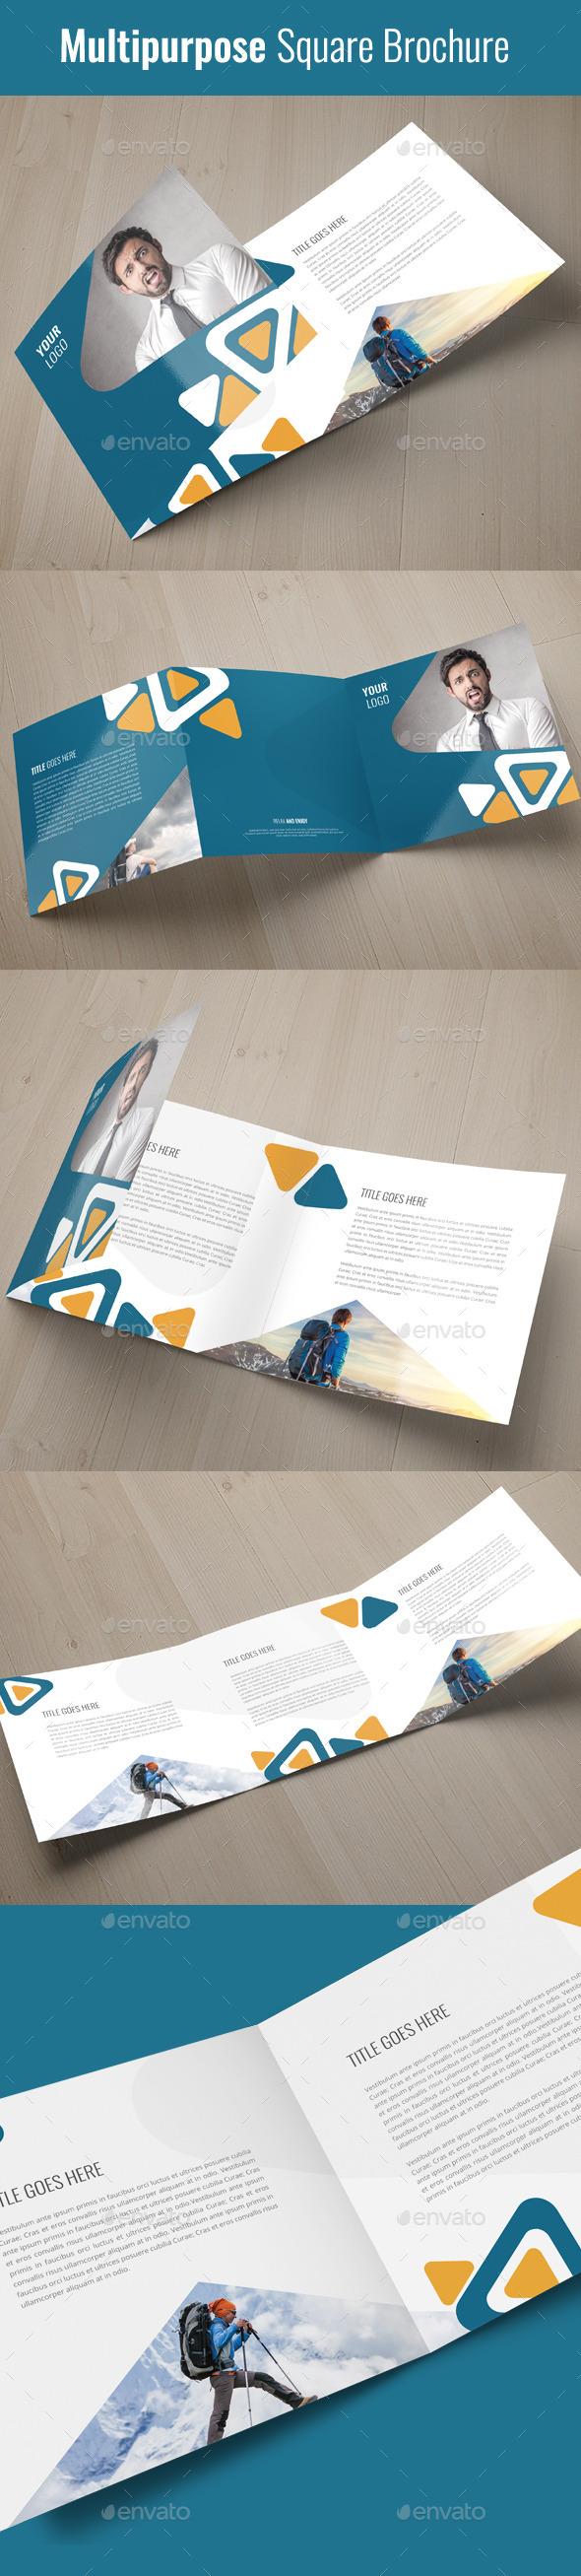 Square Trifold Brochure ( Multipurpose)   - Corporate Brochures